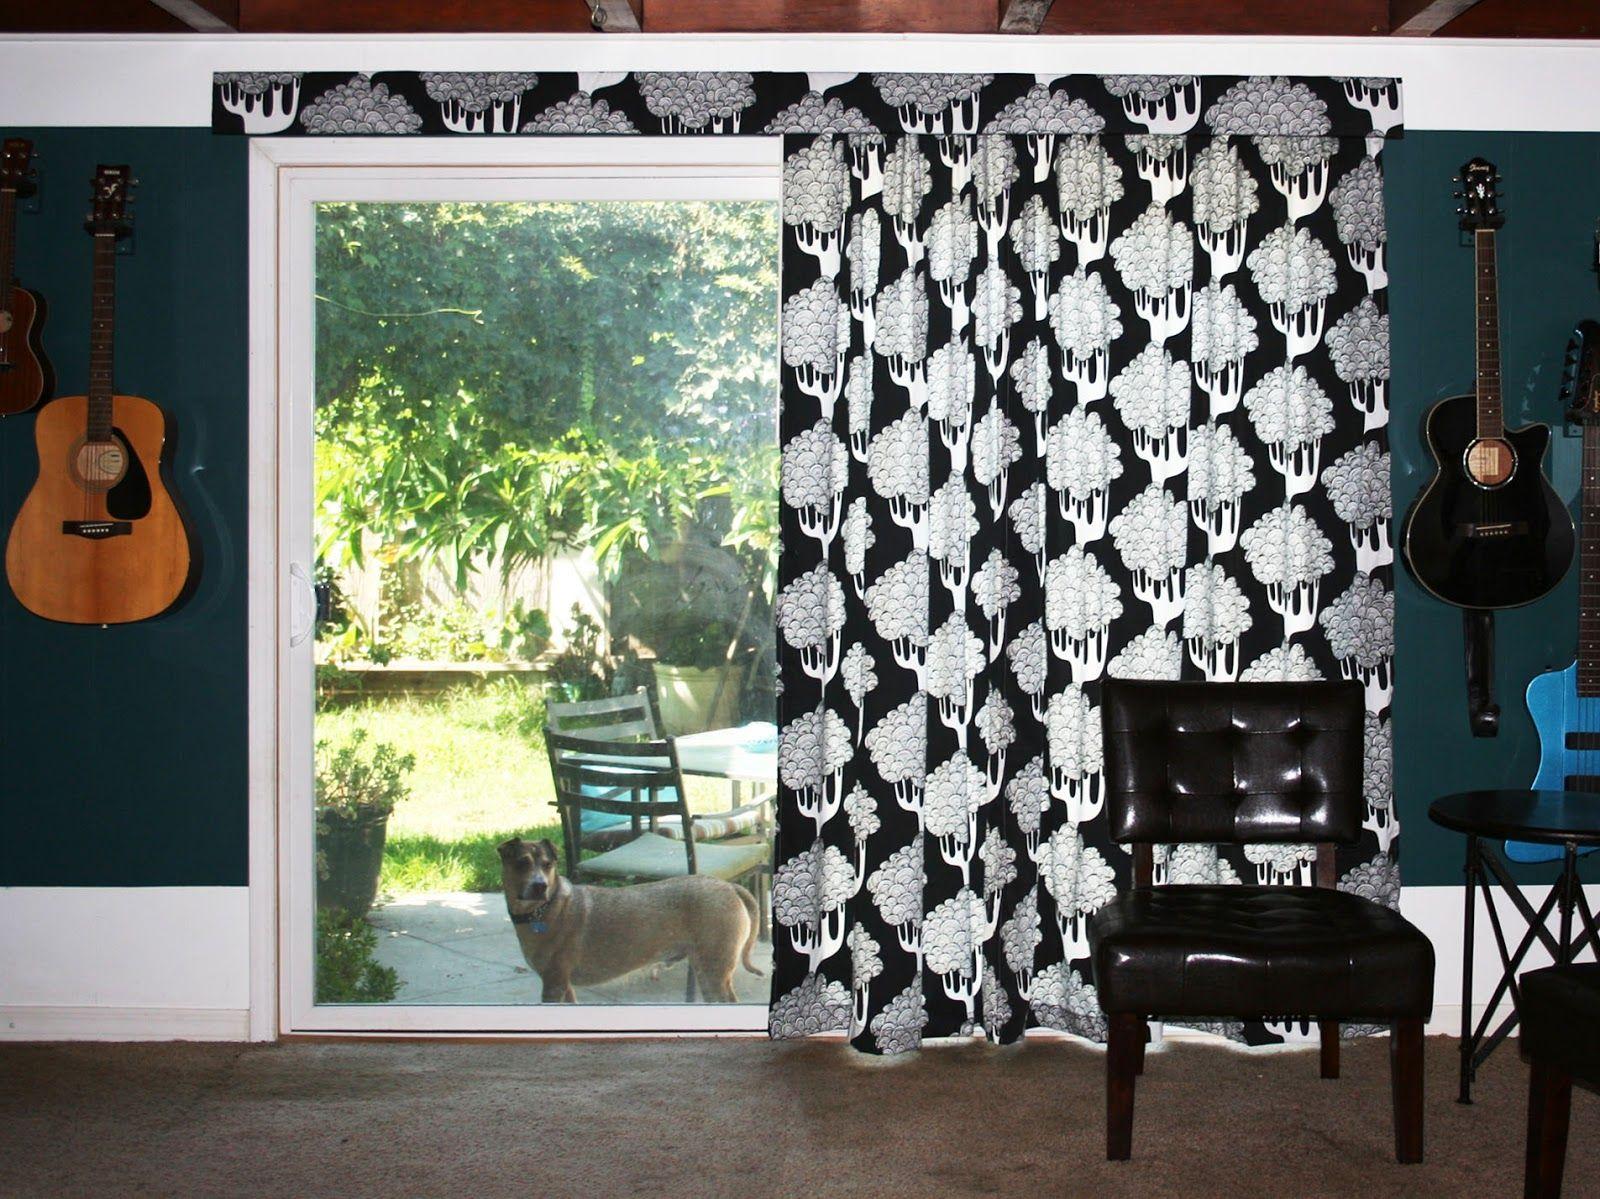 Moms eat cold food hanging curtains on a vertical blind track i